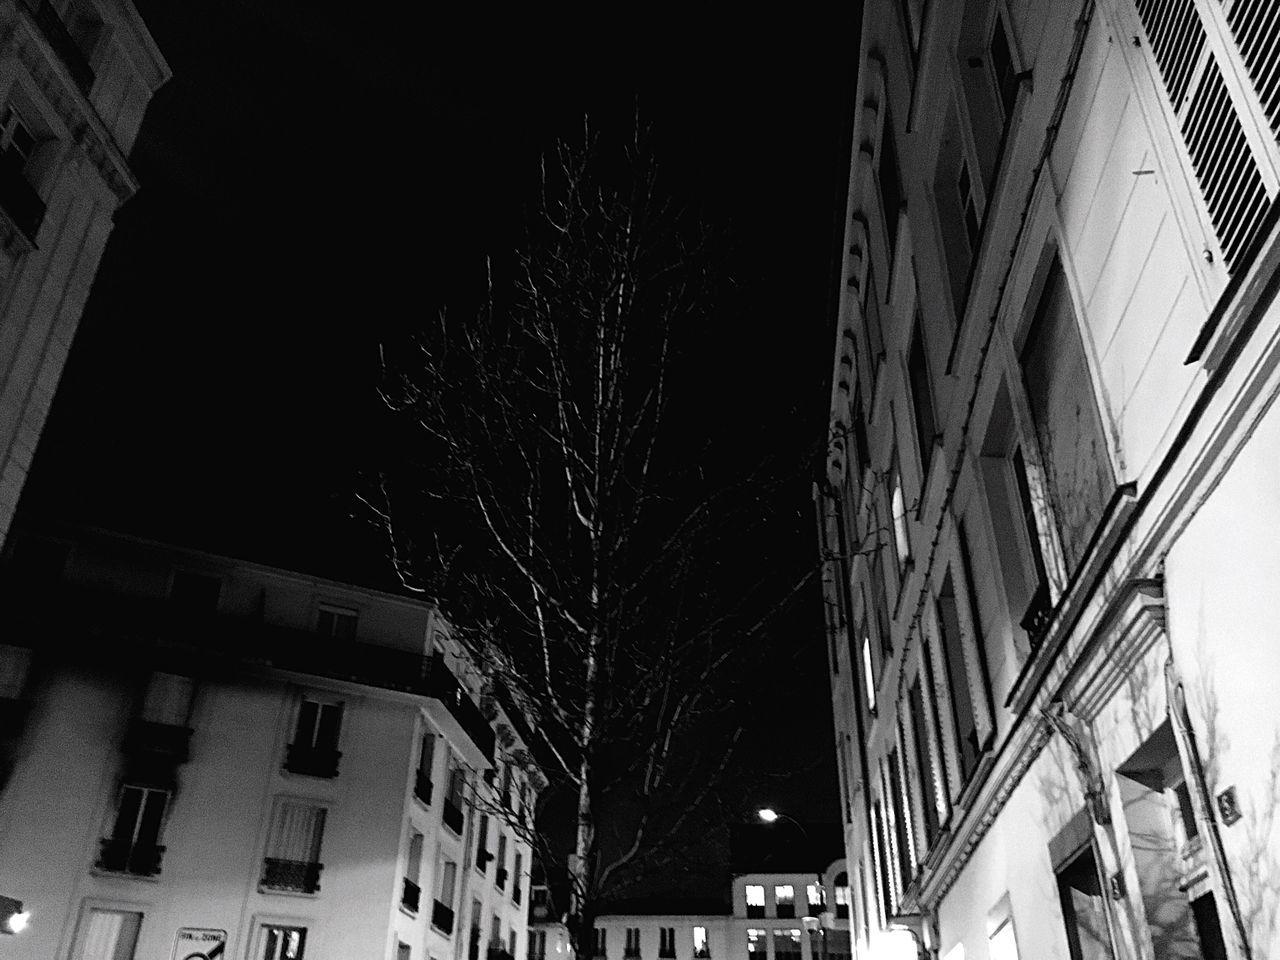 Paris At Night Tree Black And White Blackandwhitephotography Black And White Photography Black & White Blackandwhite Photography Bark At The Moon Sky Moon Blackandwhite Street Transylvanian Hunger